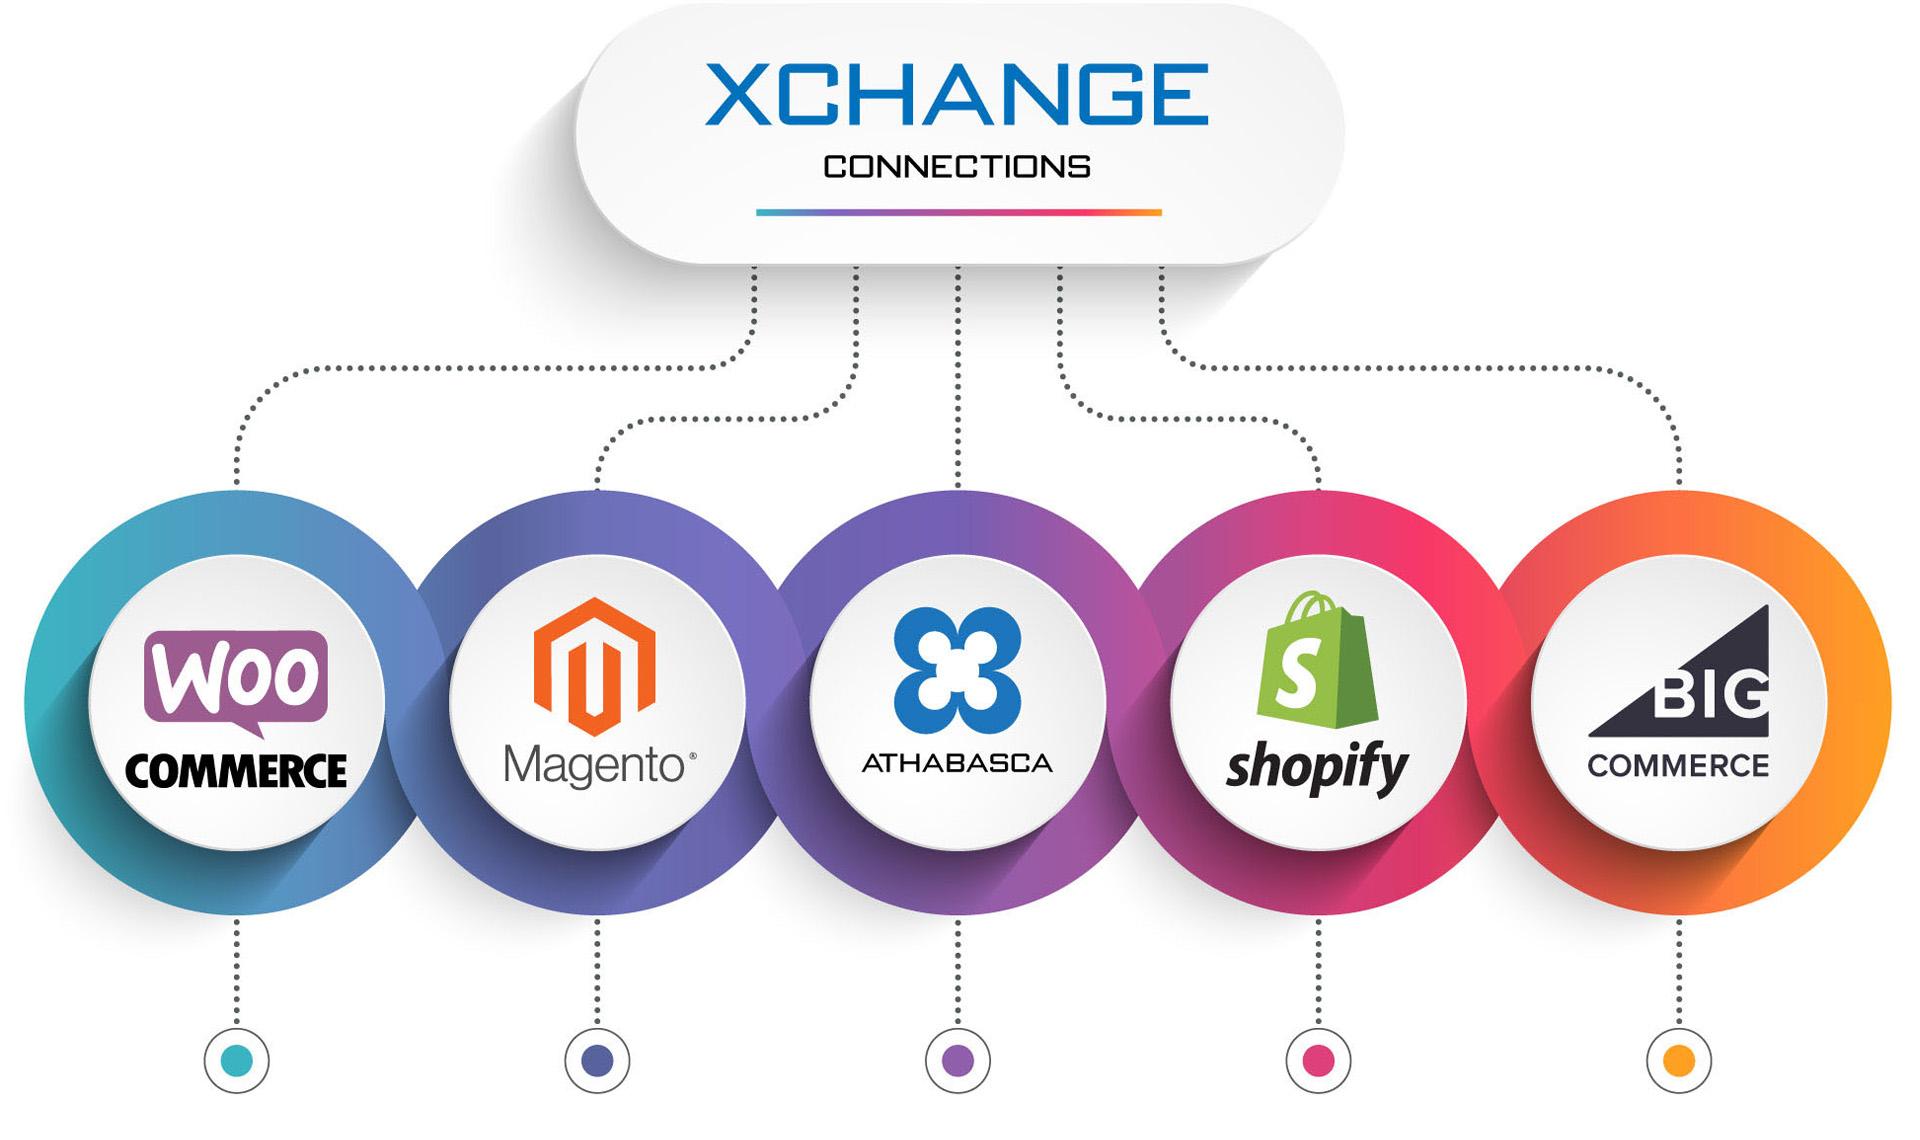 XCHANGE Market Platform